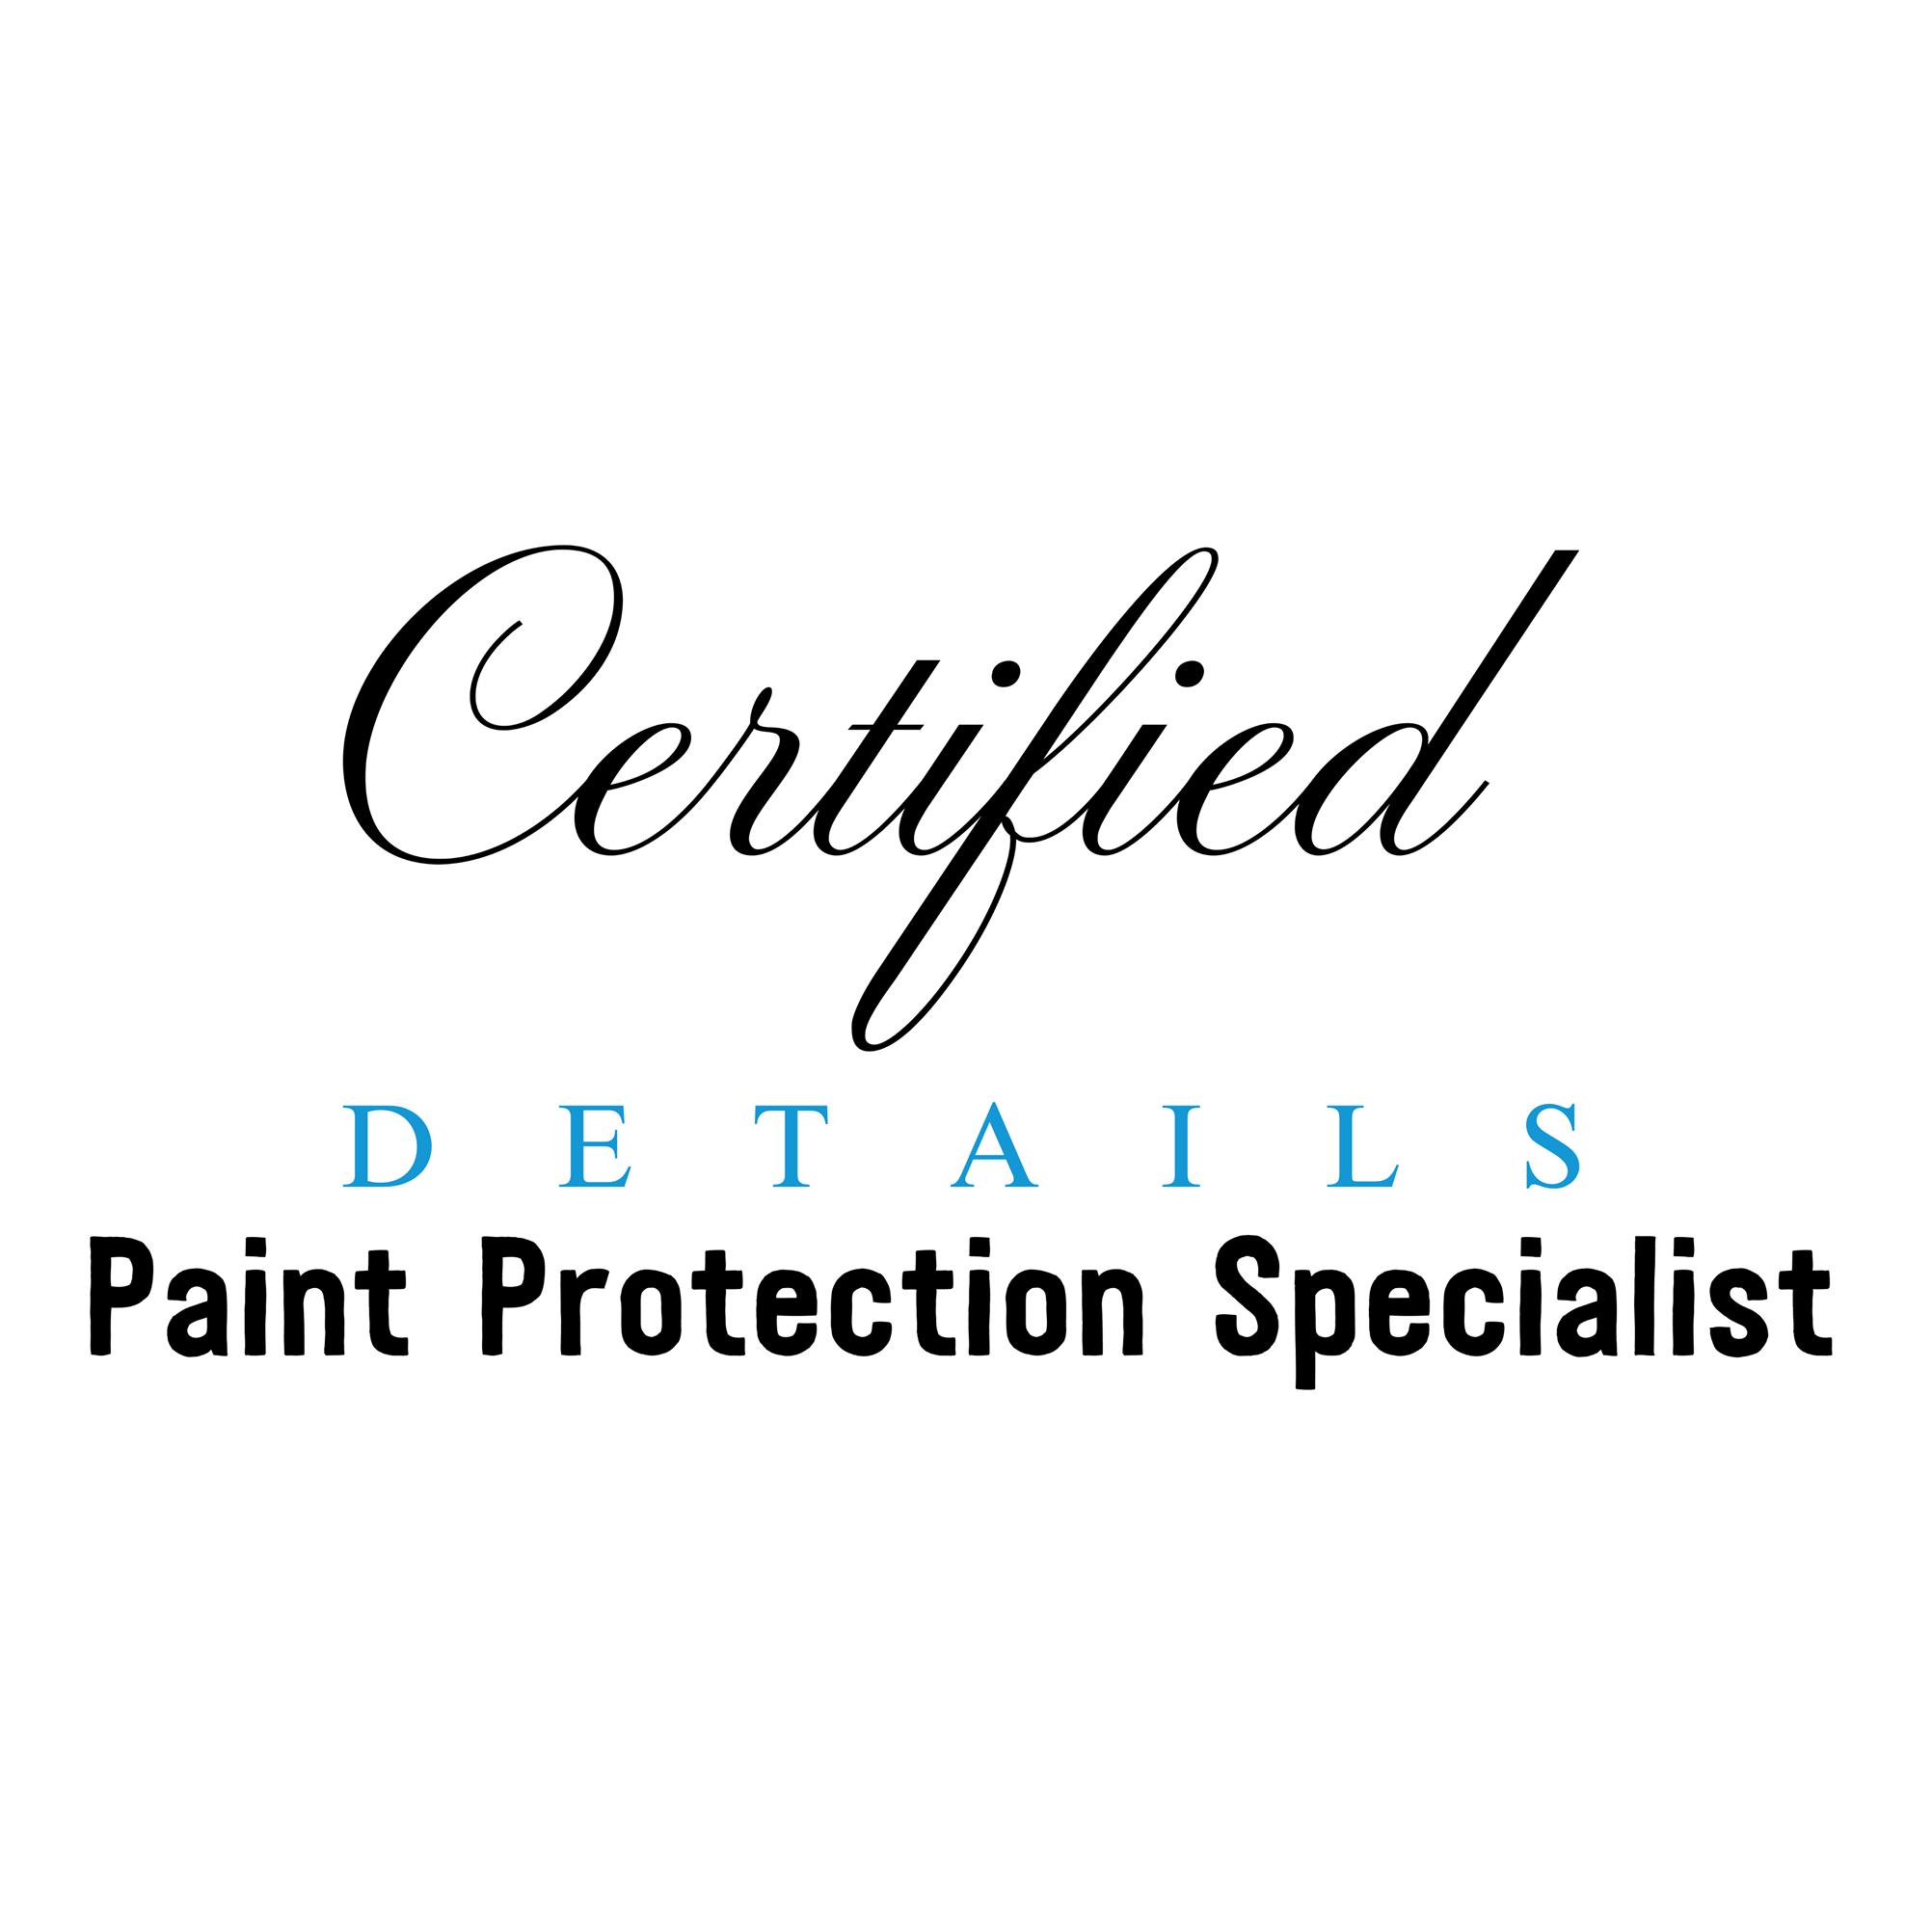 Certified Details